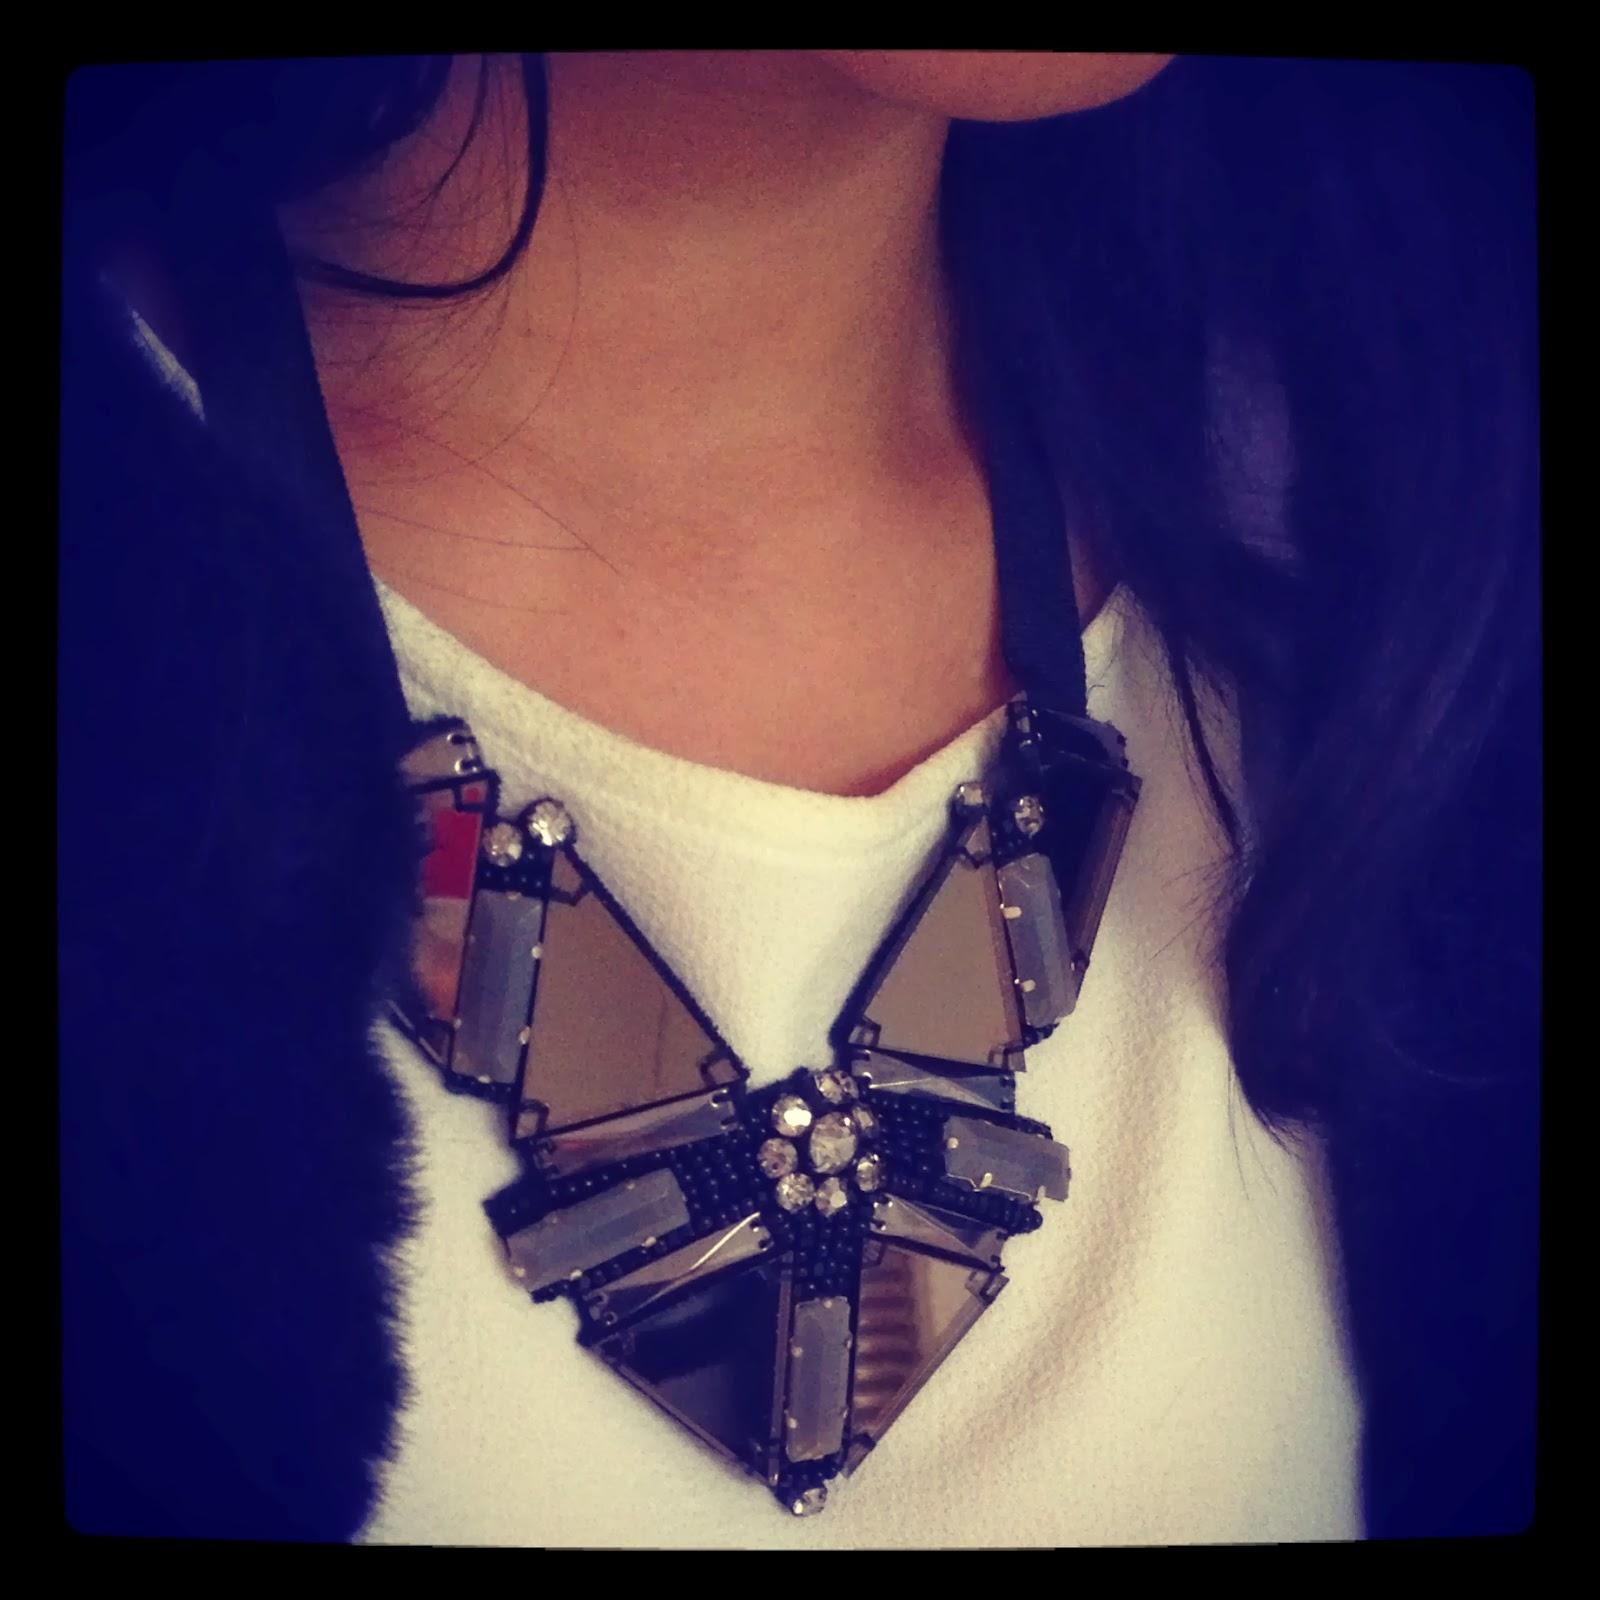 Rhinestone statemenet necklace by 495DM